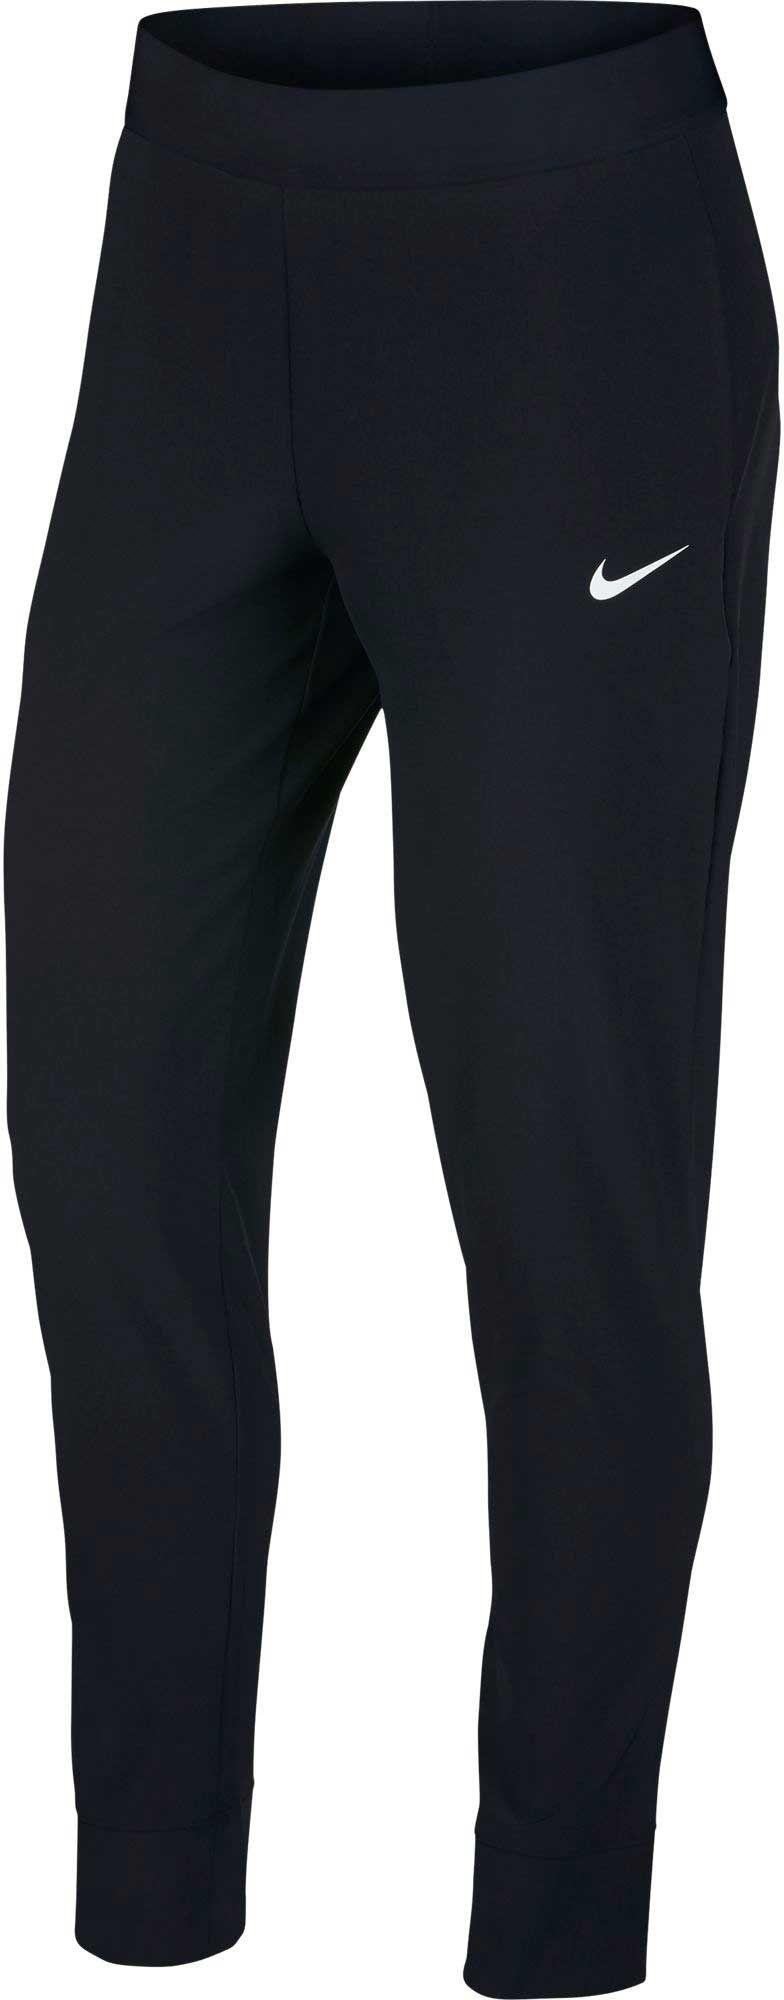 Nike Women's Bliss Victory Pants by Nike